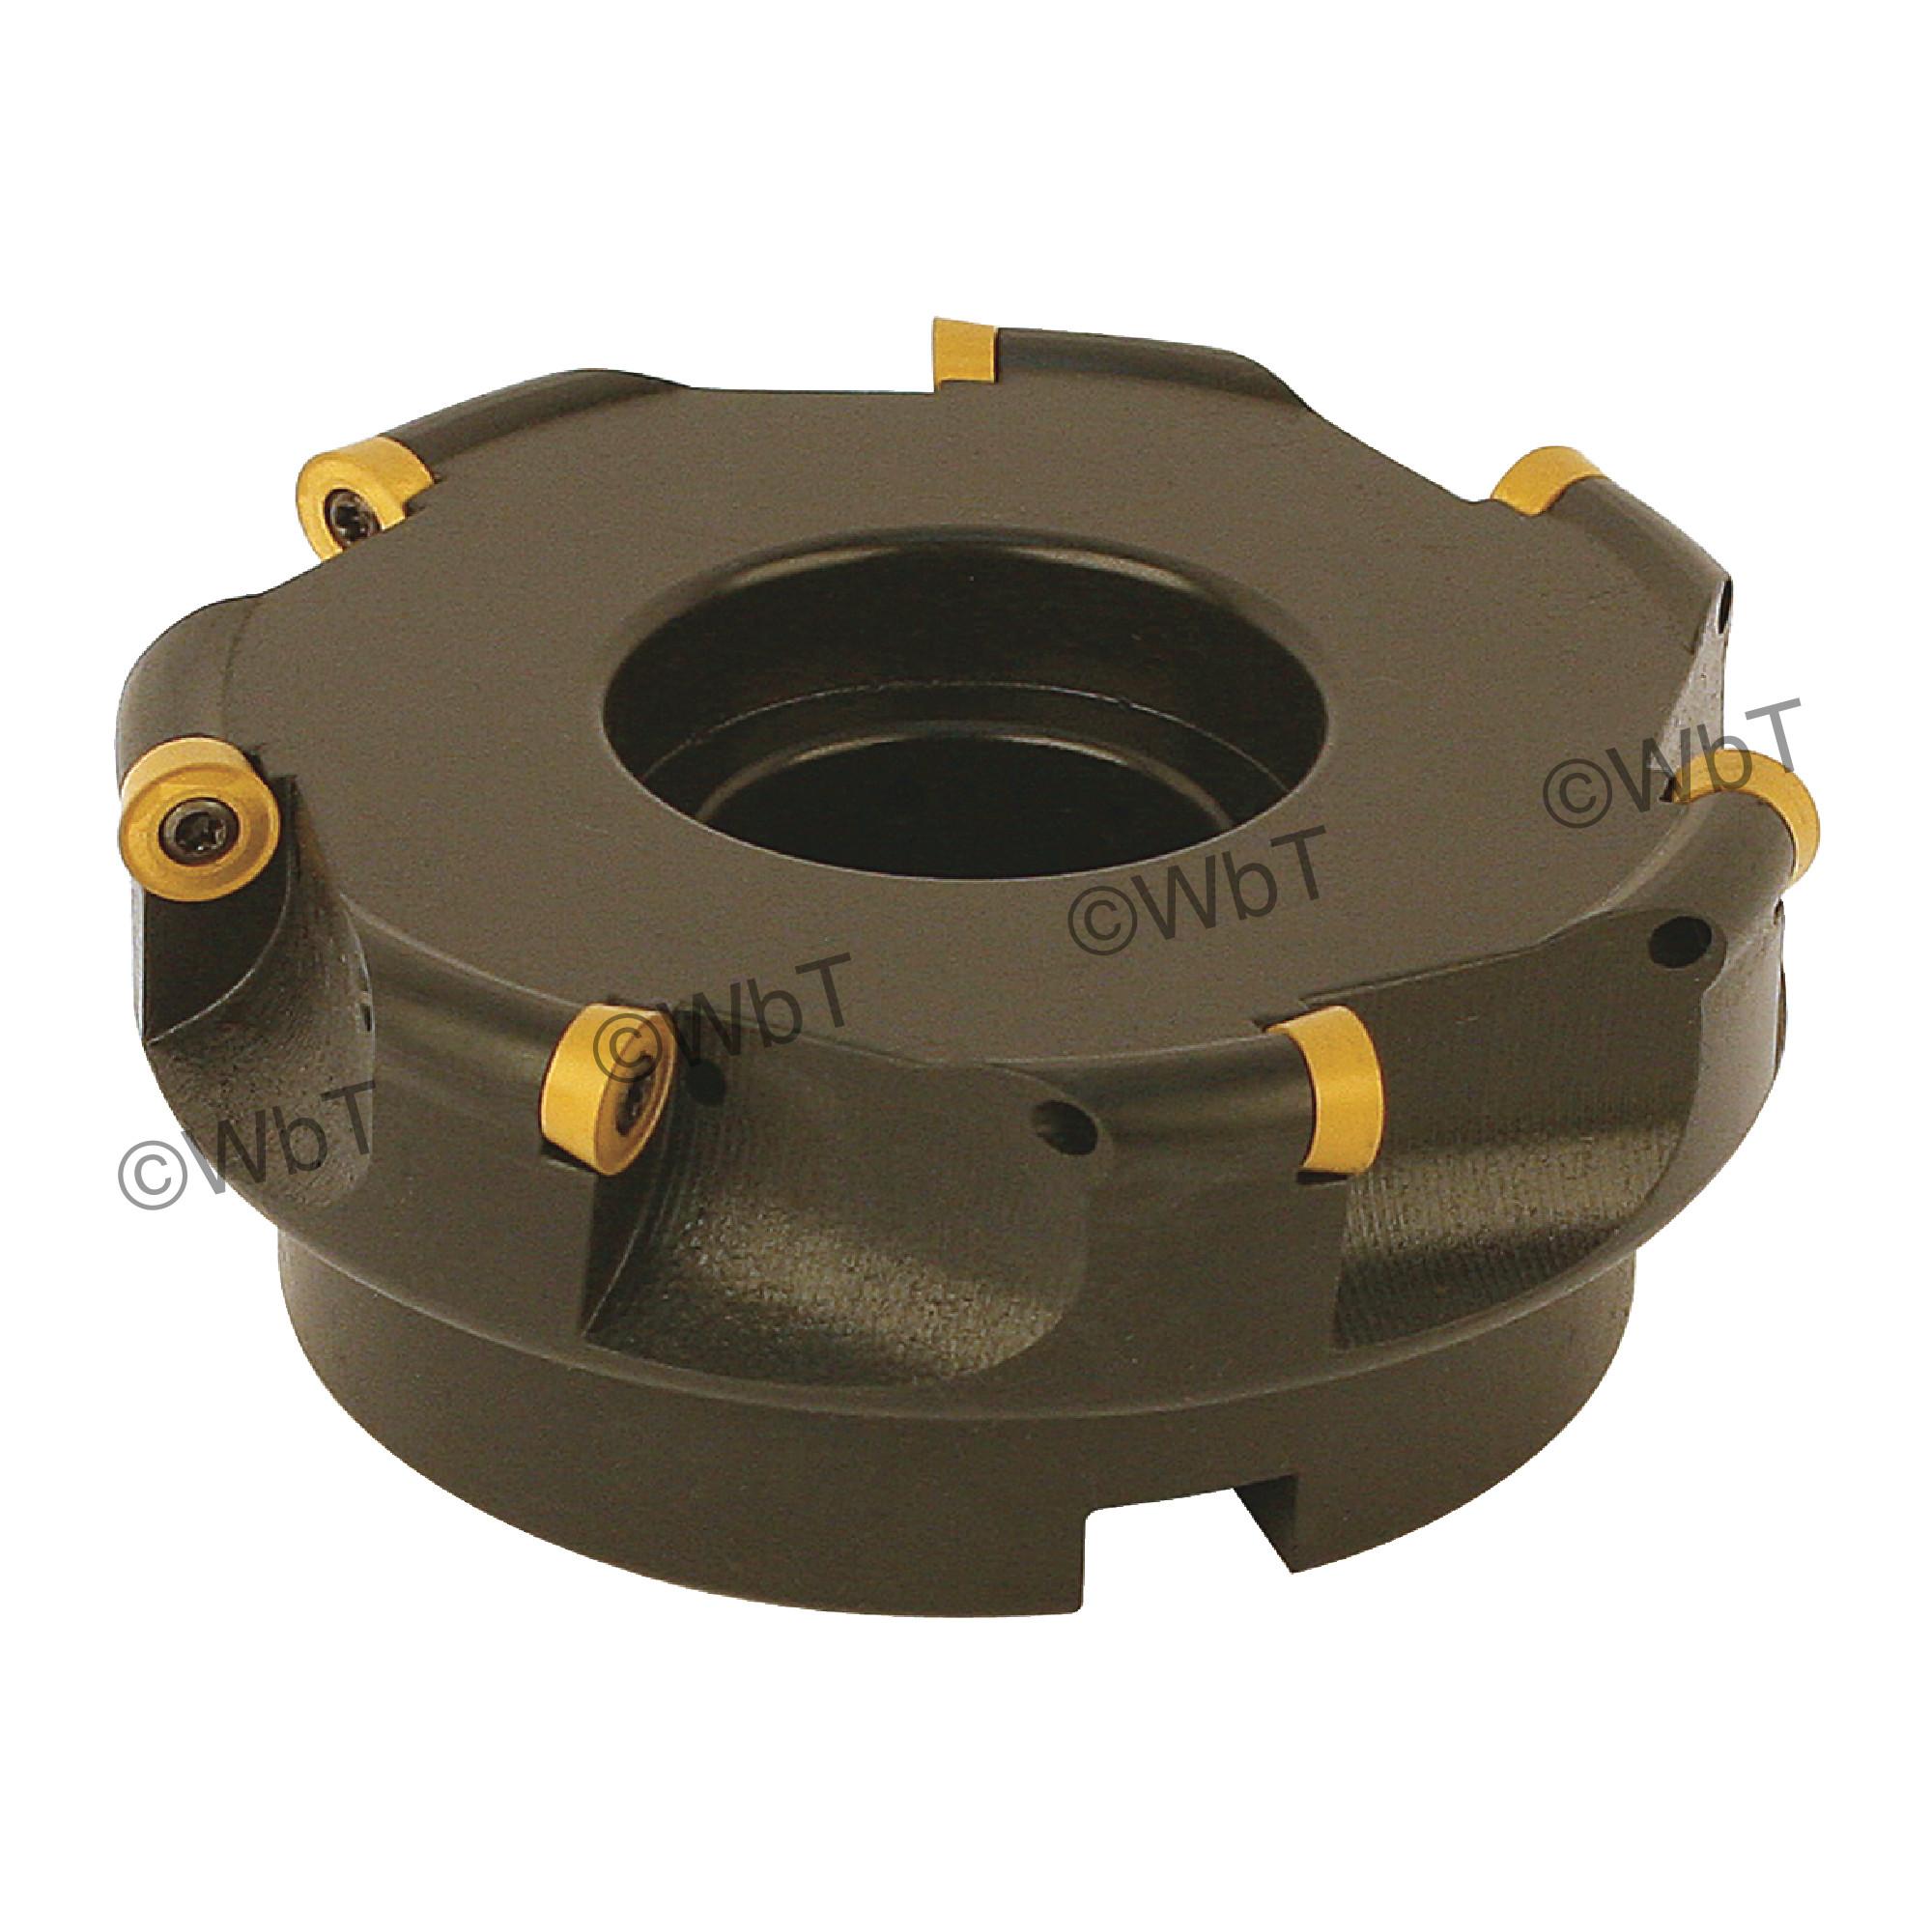 "AKUMA - 5.000"" Face Mill Set / Includes: (1) RPC.43.500R-7 (5.0""ø) & (10) RPMT1204M0S-M1 CM30P Coated Inserts / R"